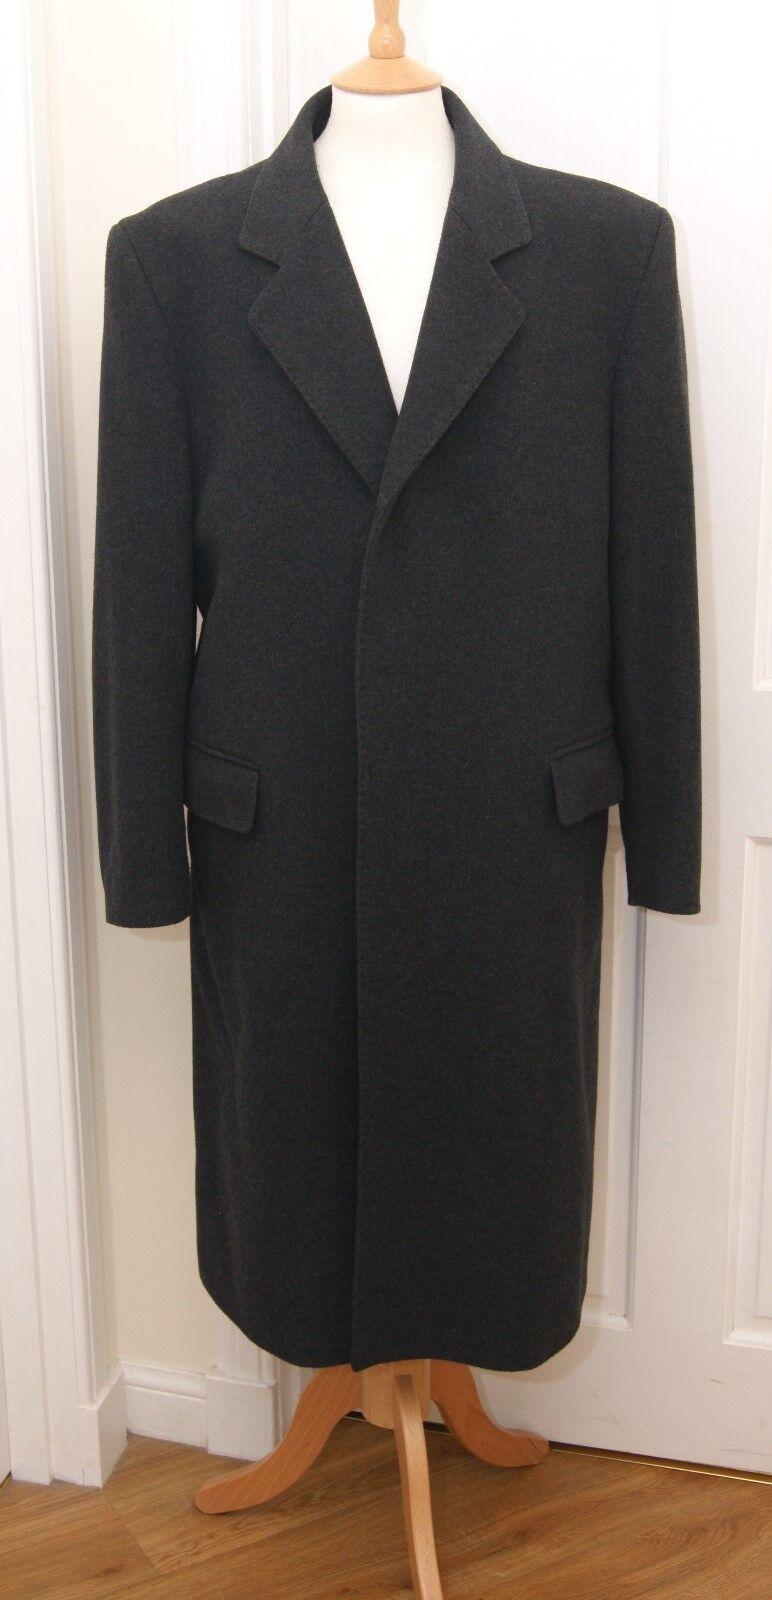 Brook Taverner grey wool cashmere single breasted overcoat coat 38  97cm reg.